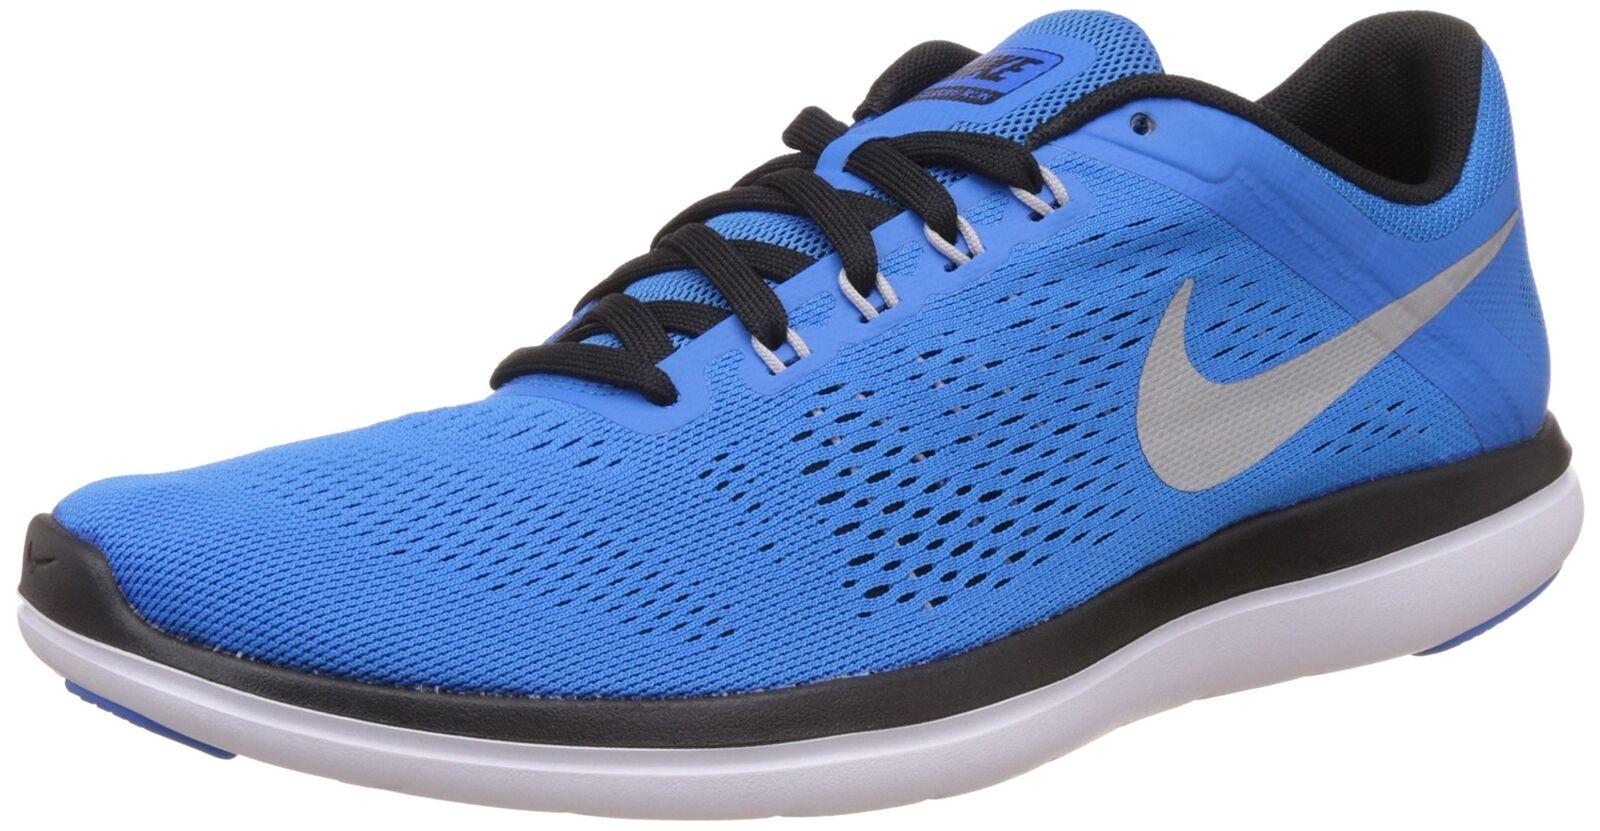 97c163a72083b Mens Nike Flex 2016 RN Running Shoes Size 13 Blue White Black Silver ...